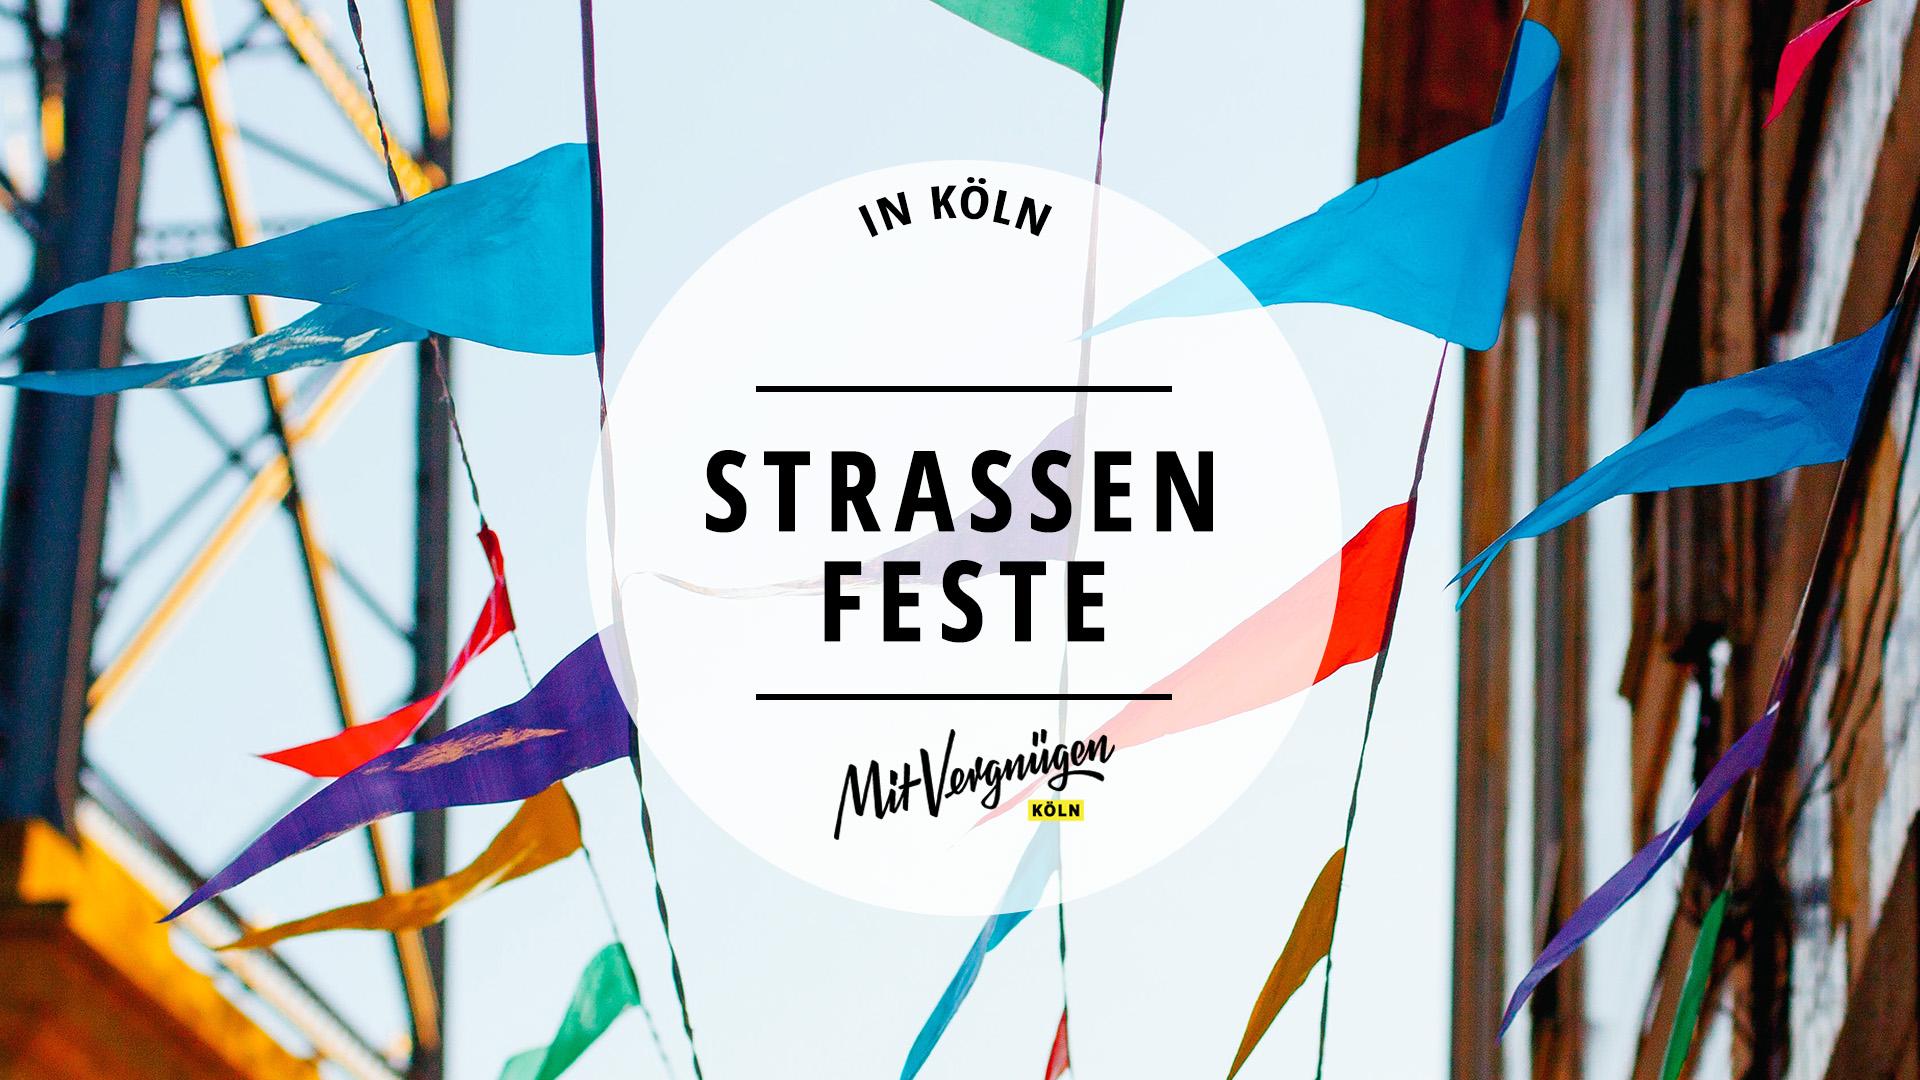 Strassenfeste In Köln